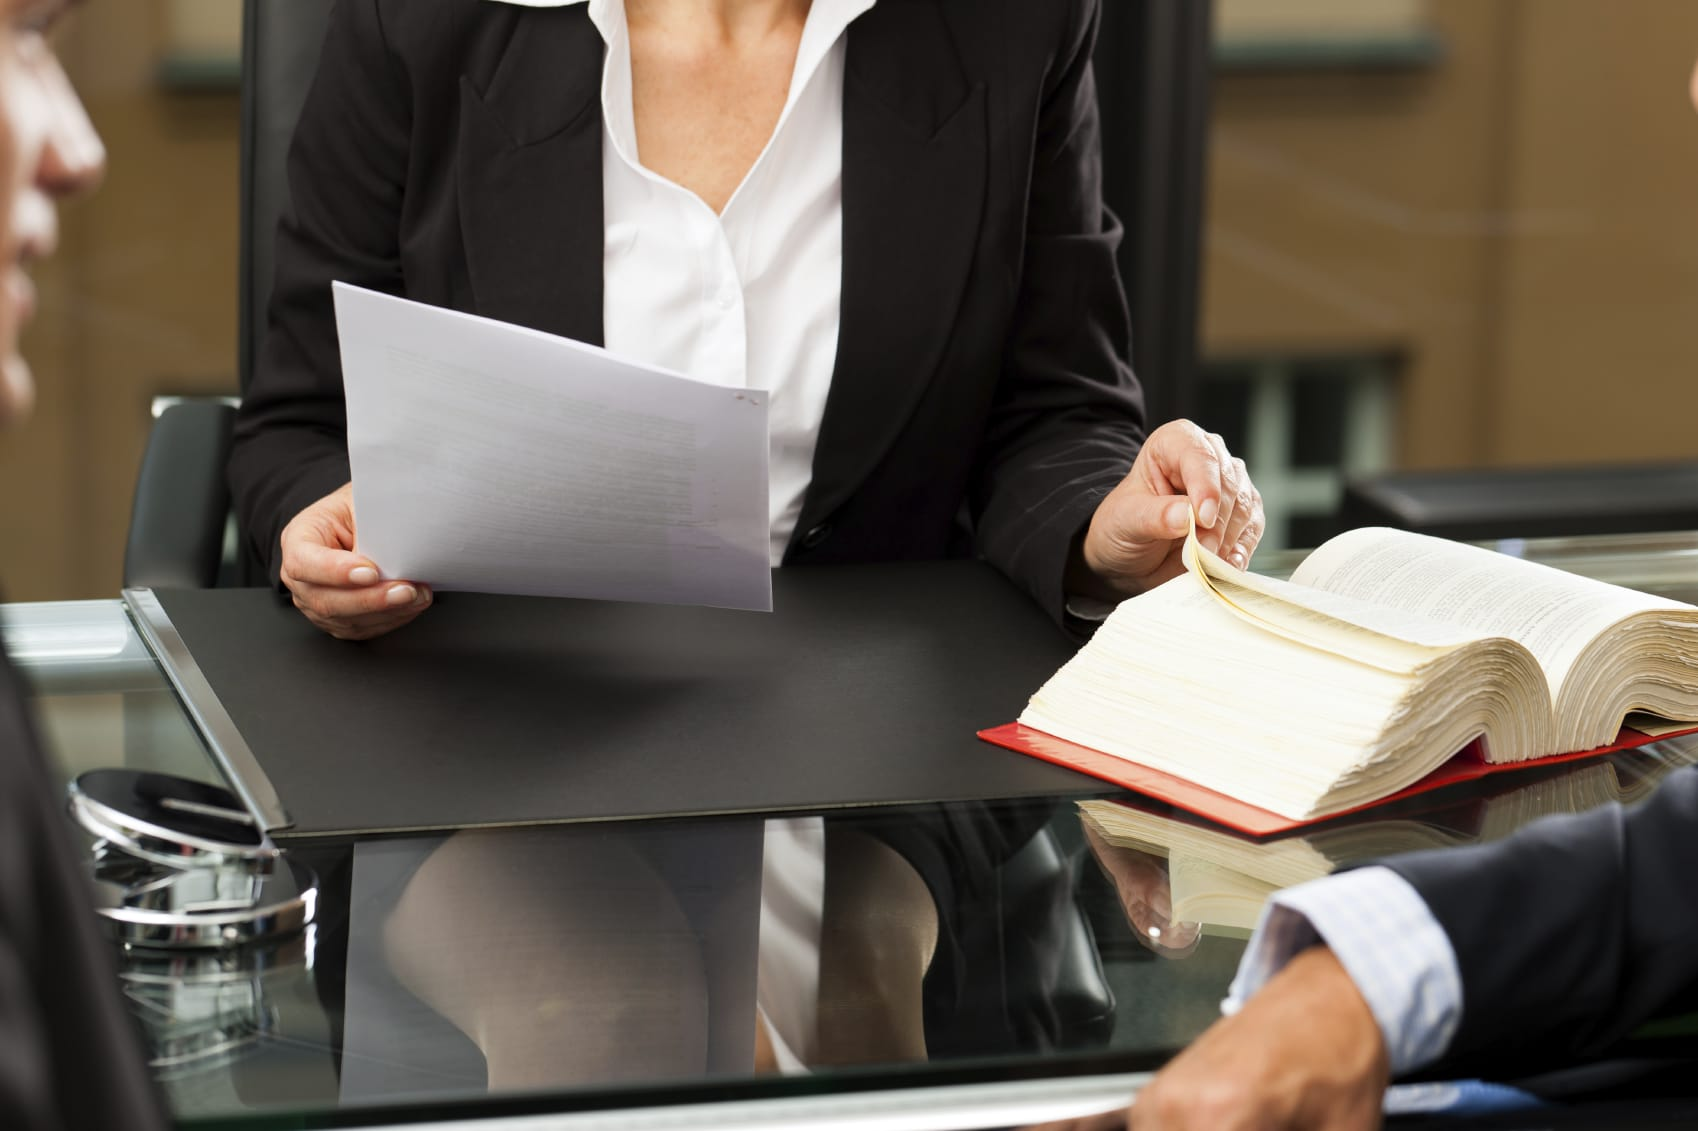 reclamar-facturas-impagadas-profesionales-abogado-almería-